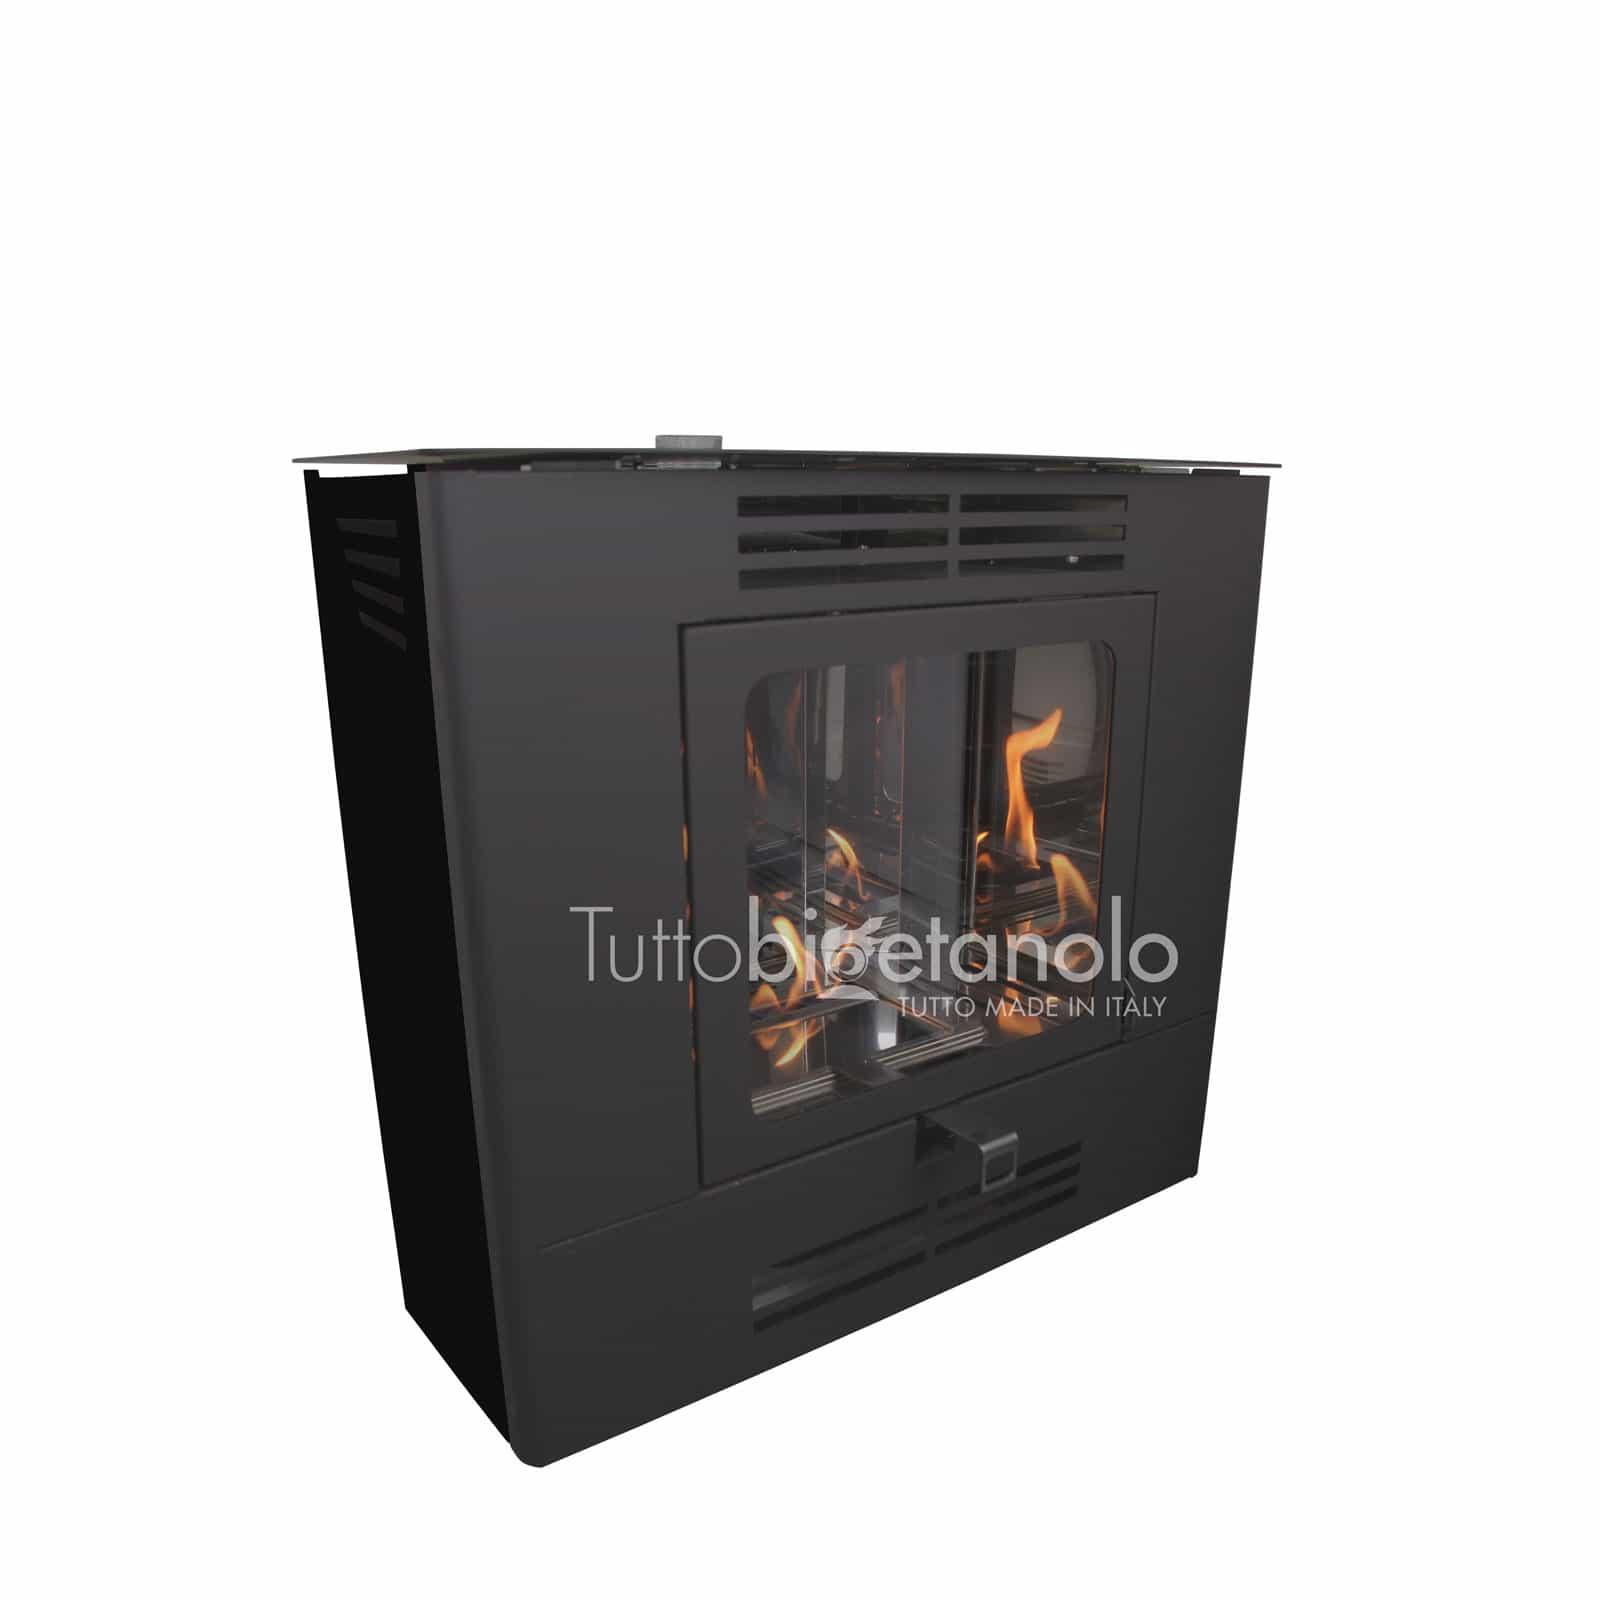 Stufa a bioetanolo Easy Corner made in Italy - Tuttobioetanolo